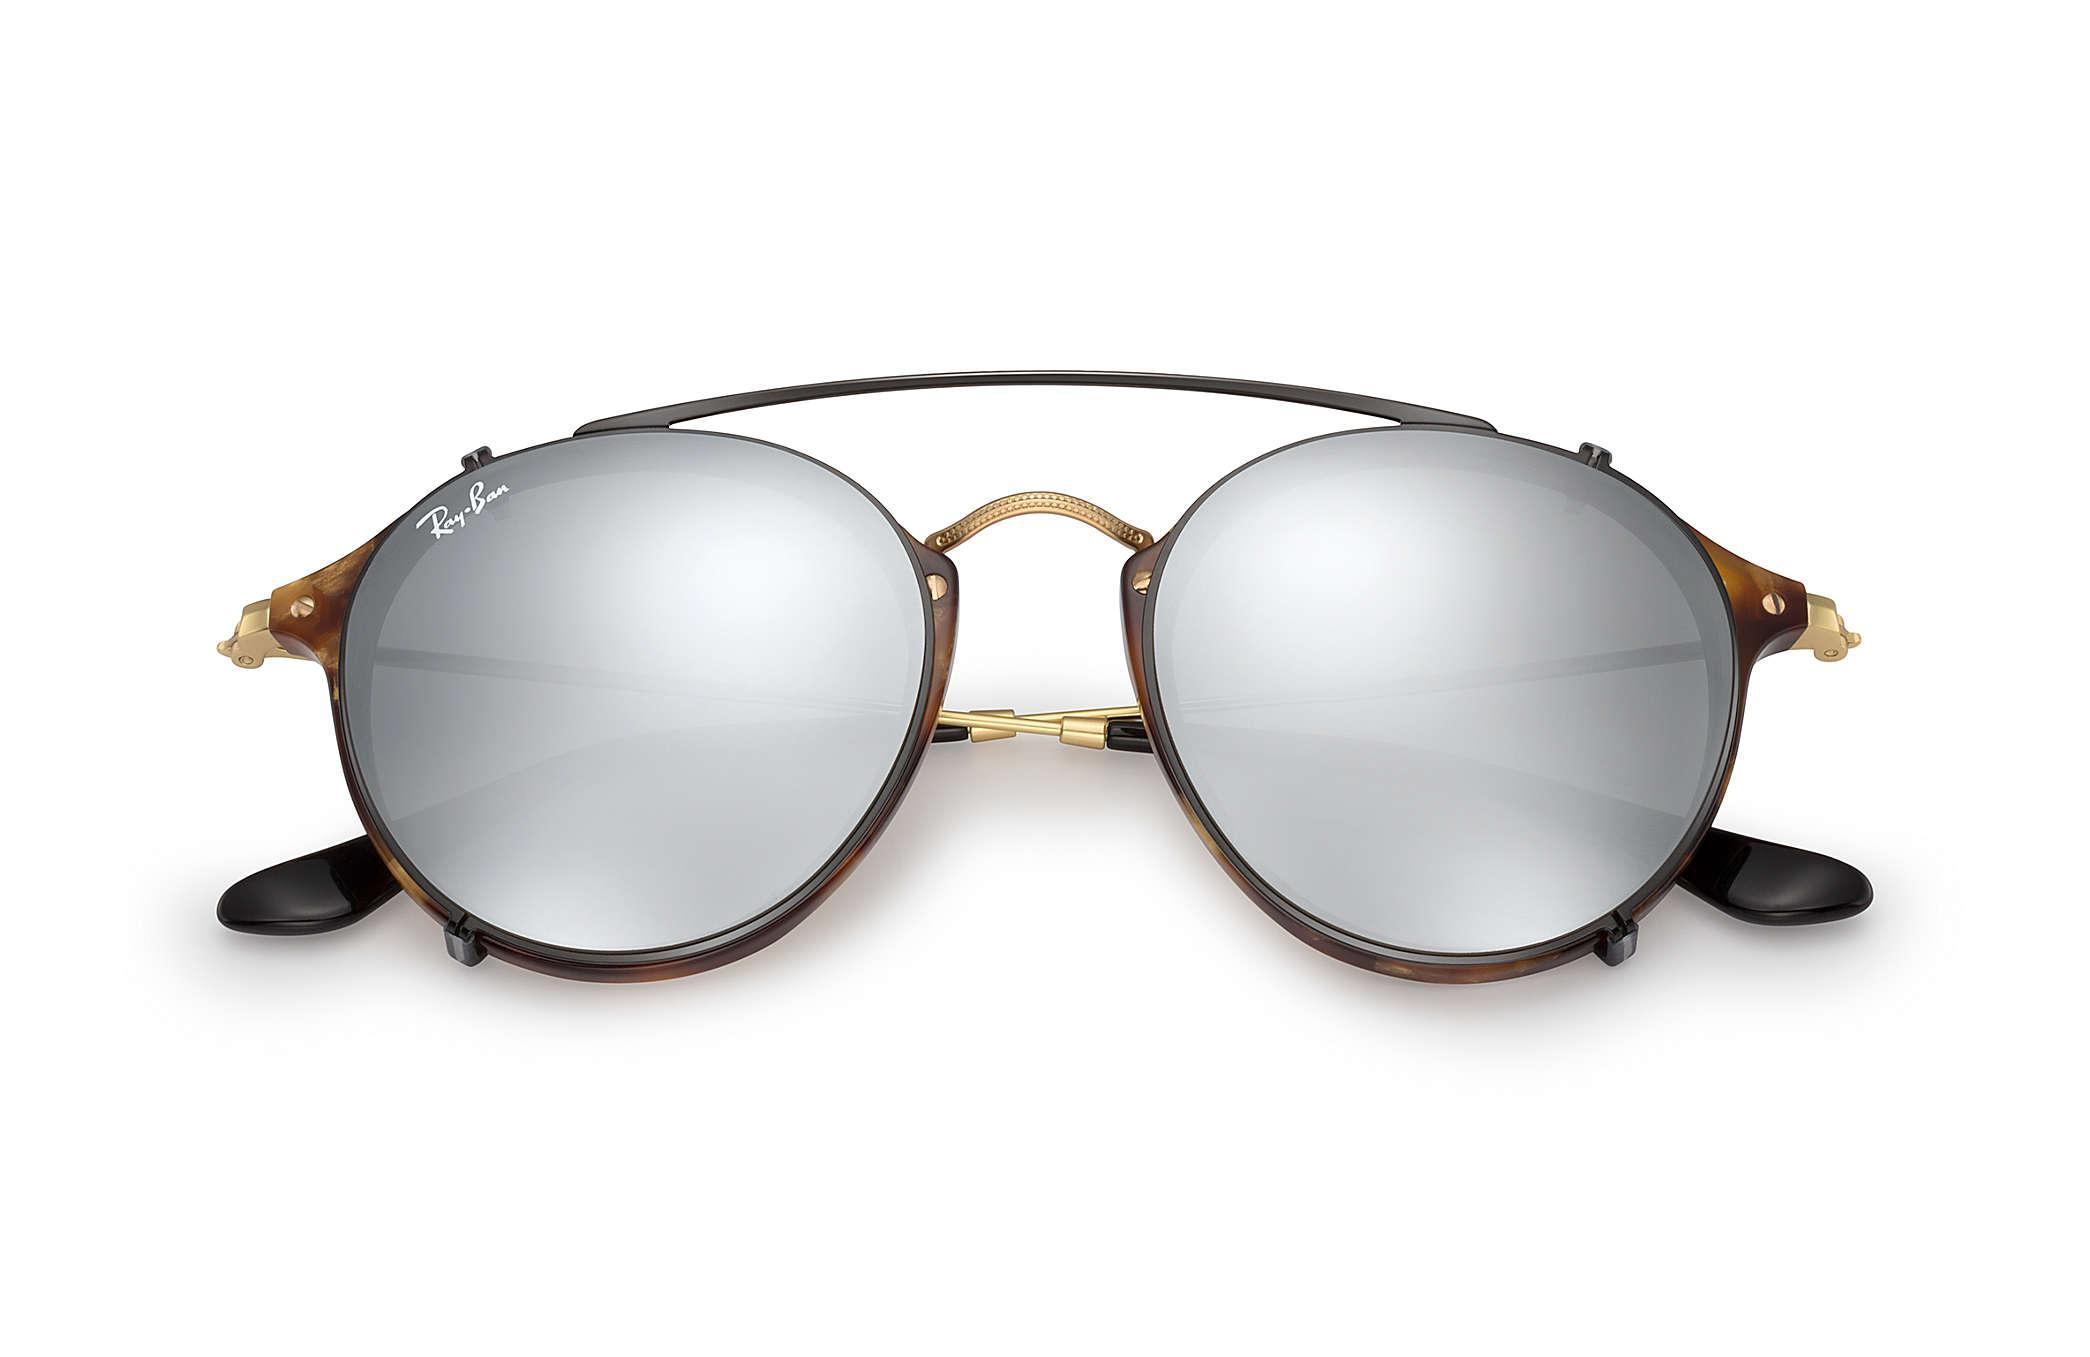 Ray Ban Clubmaster Clip On Sunglasses Heritage Malta